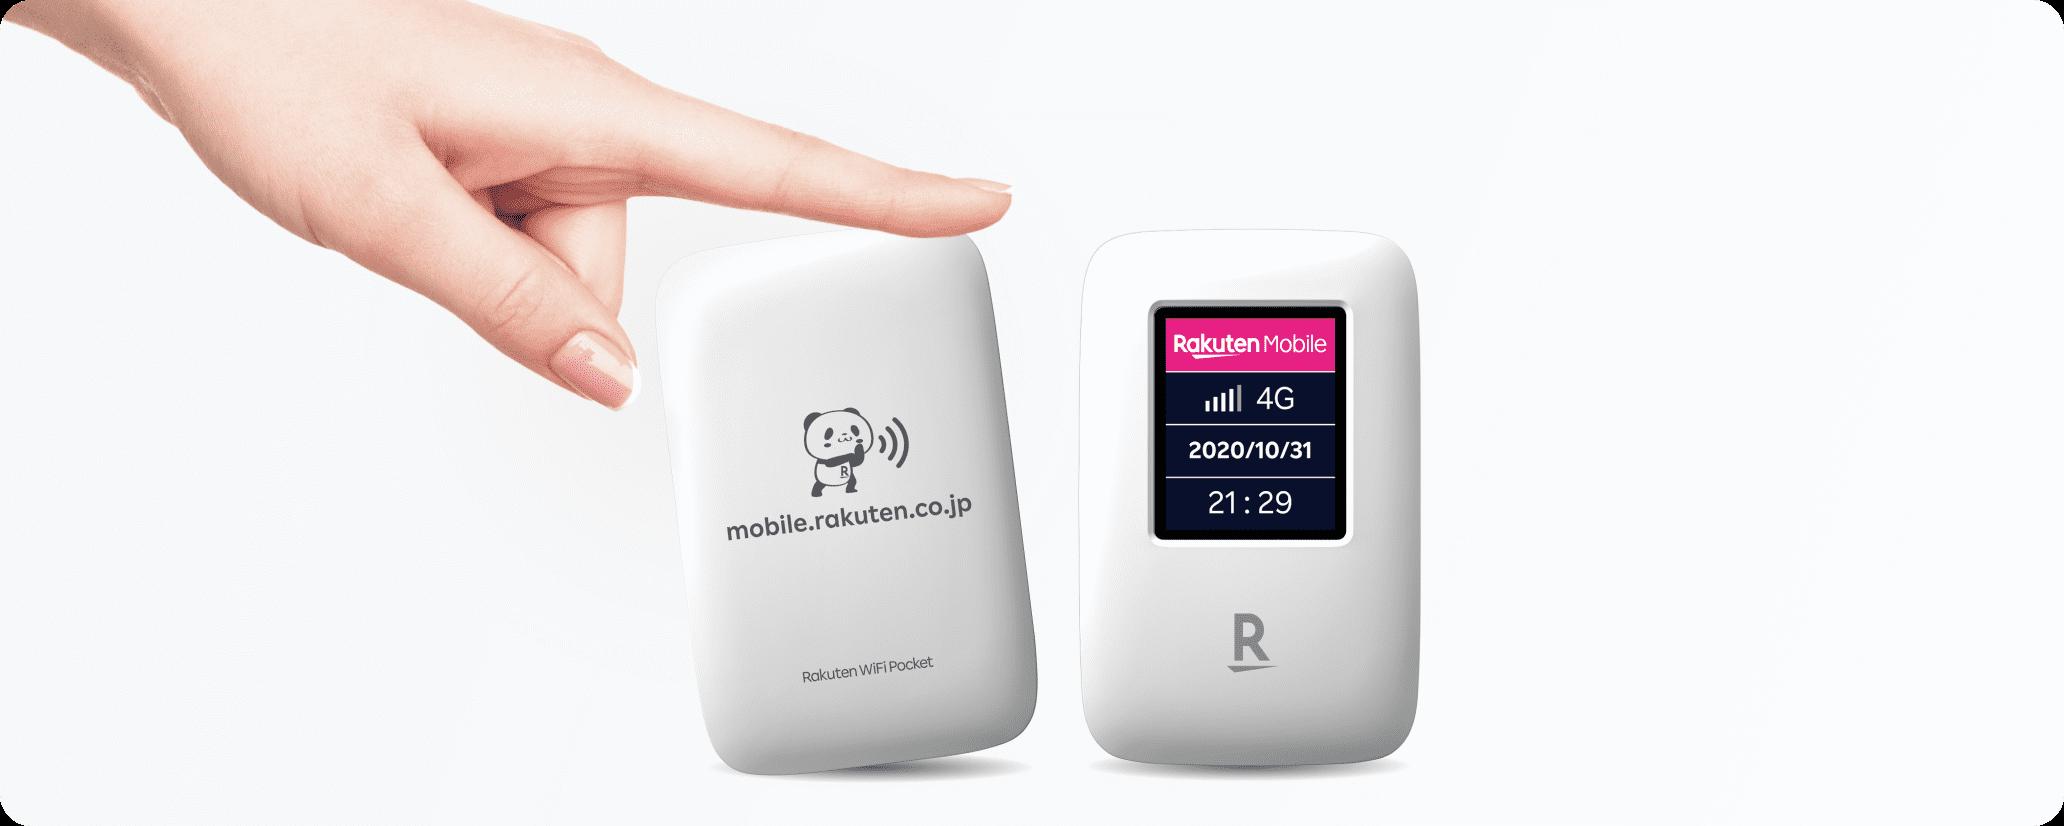 Rakuten WiFi Pocketの端末!